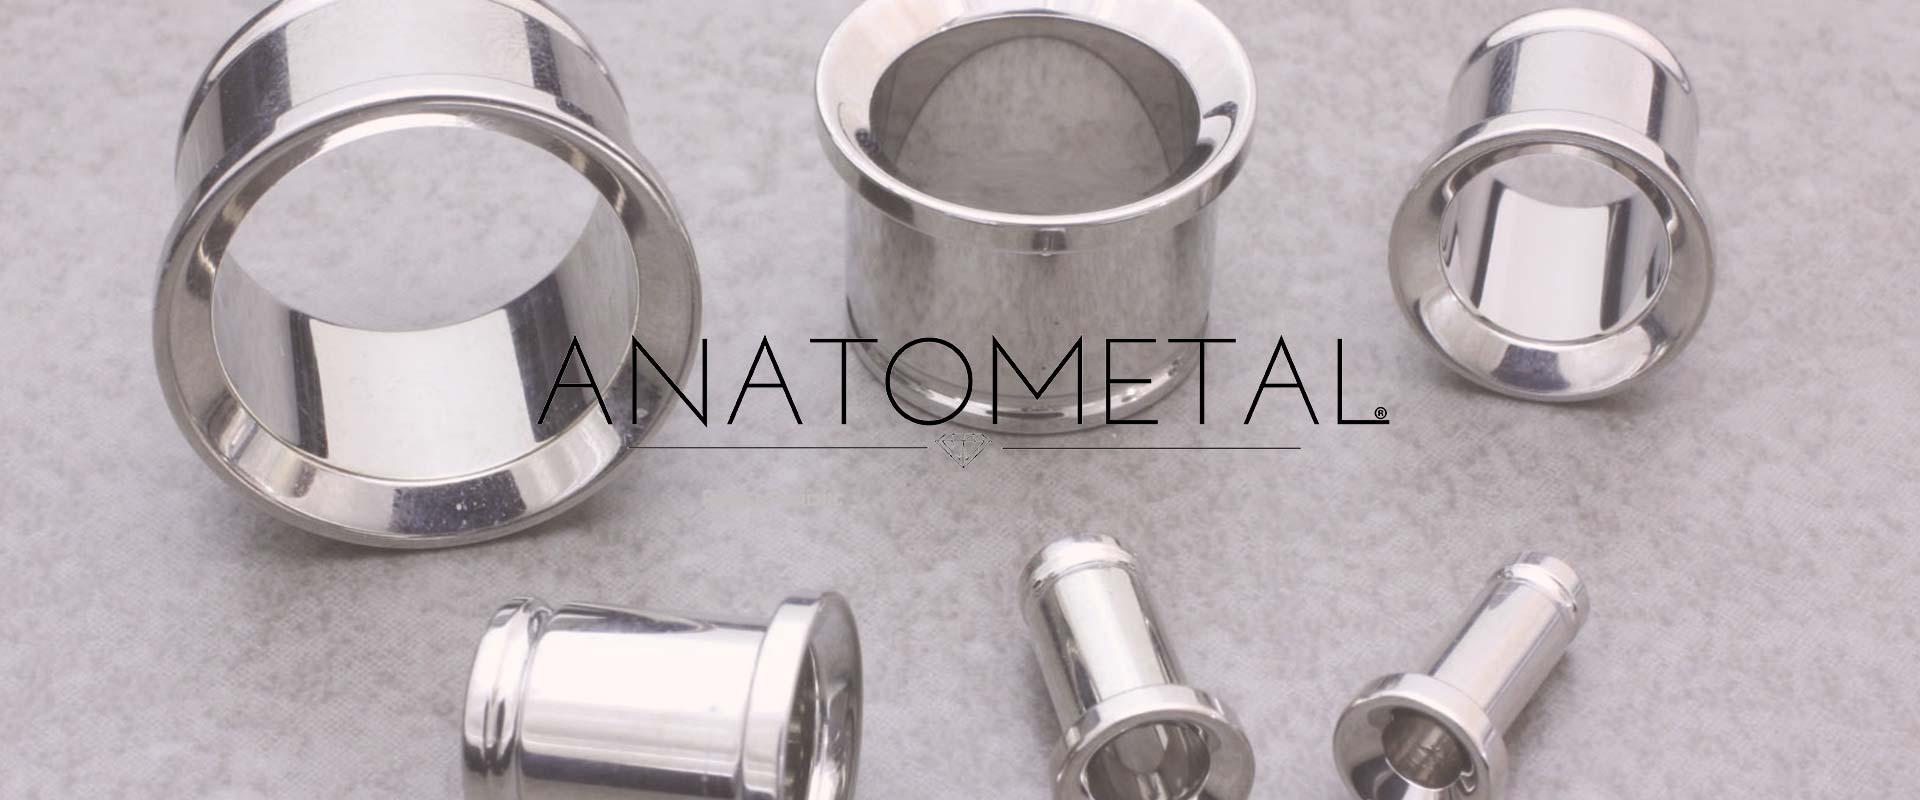 anatometal-3-logo